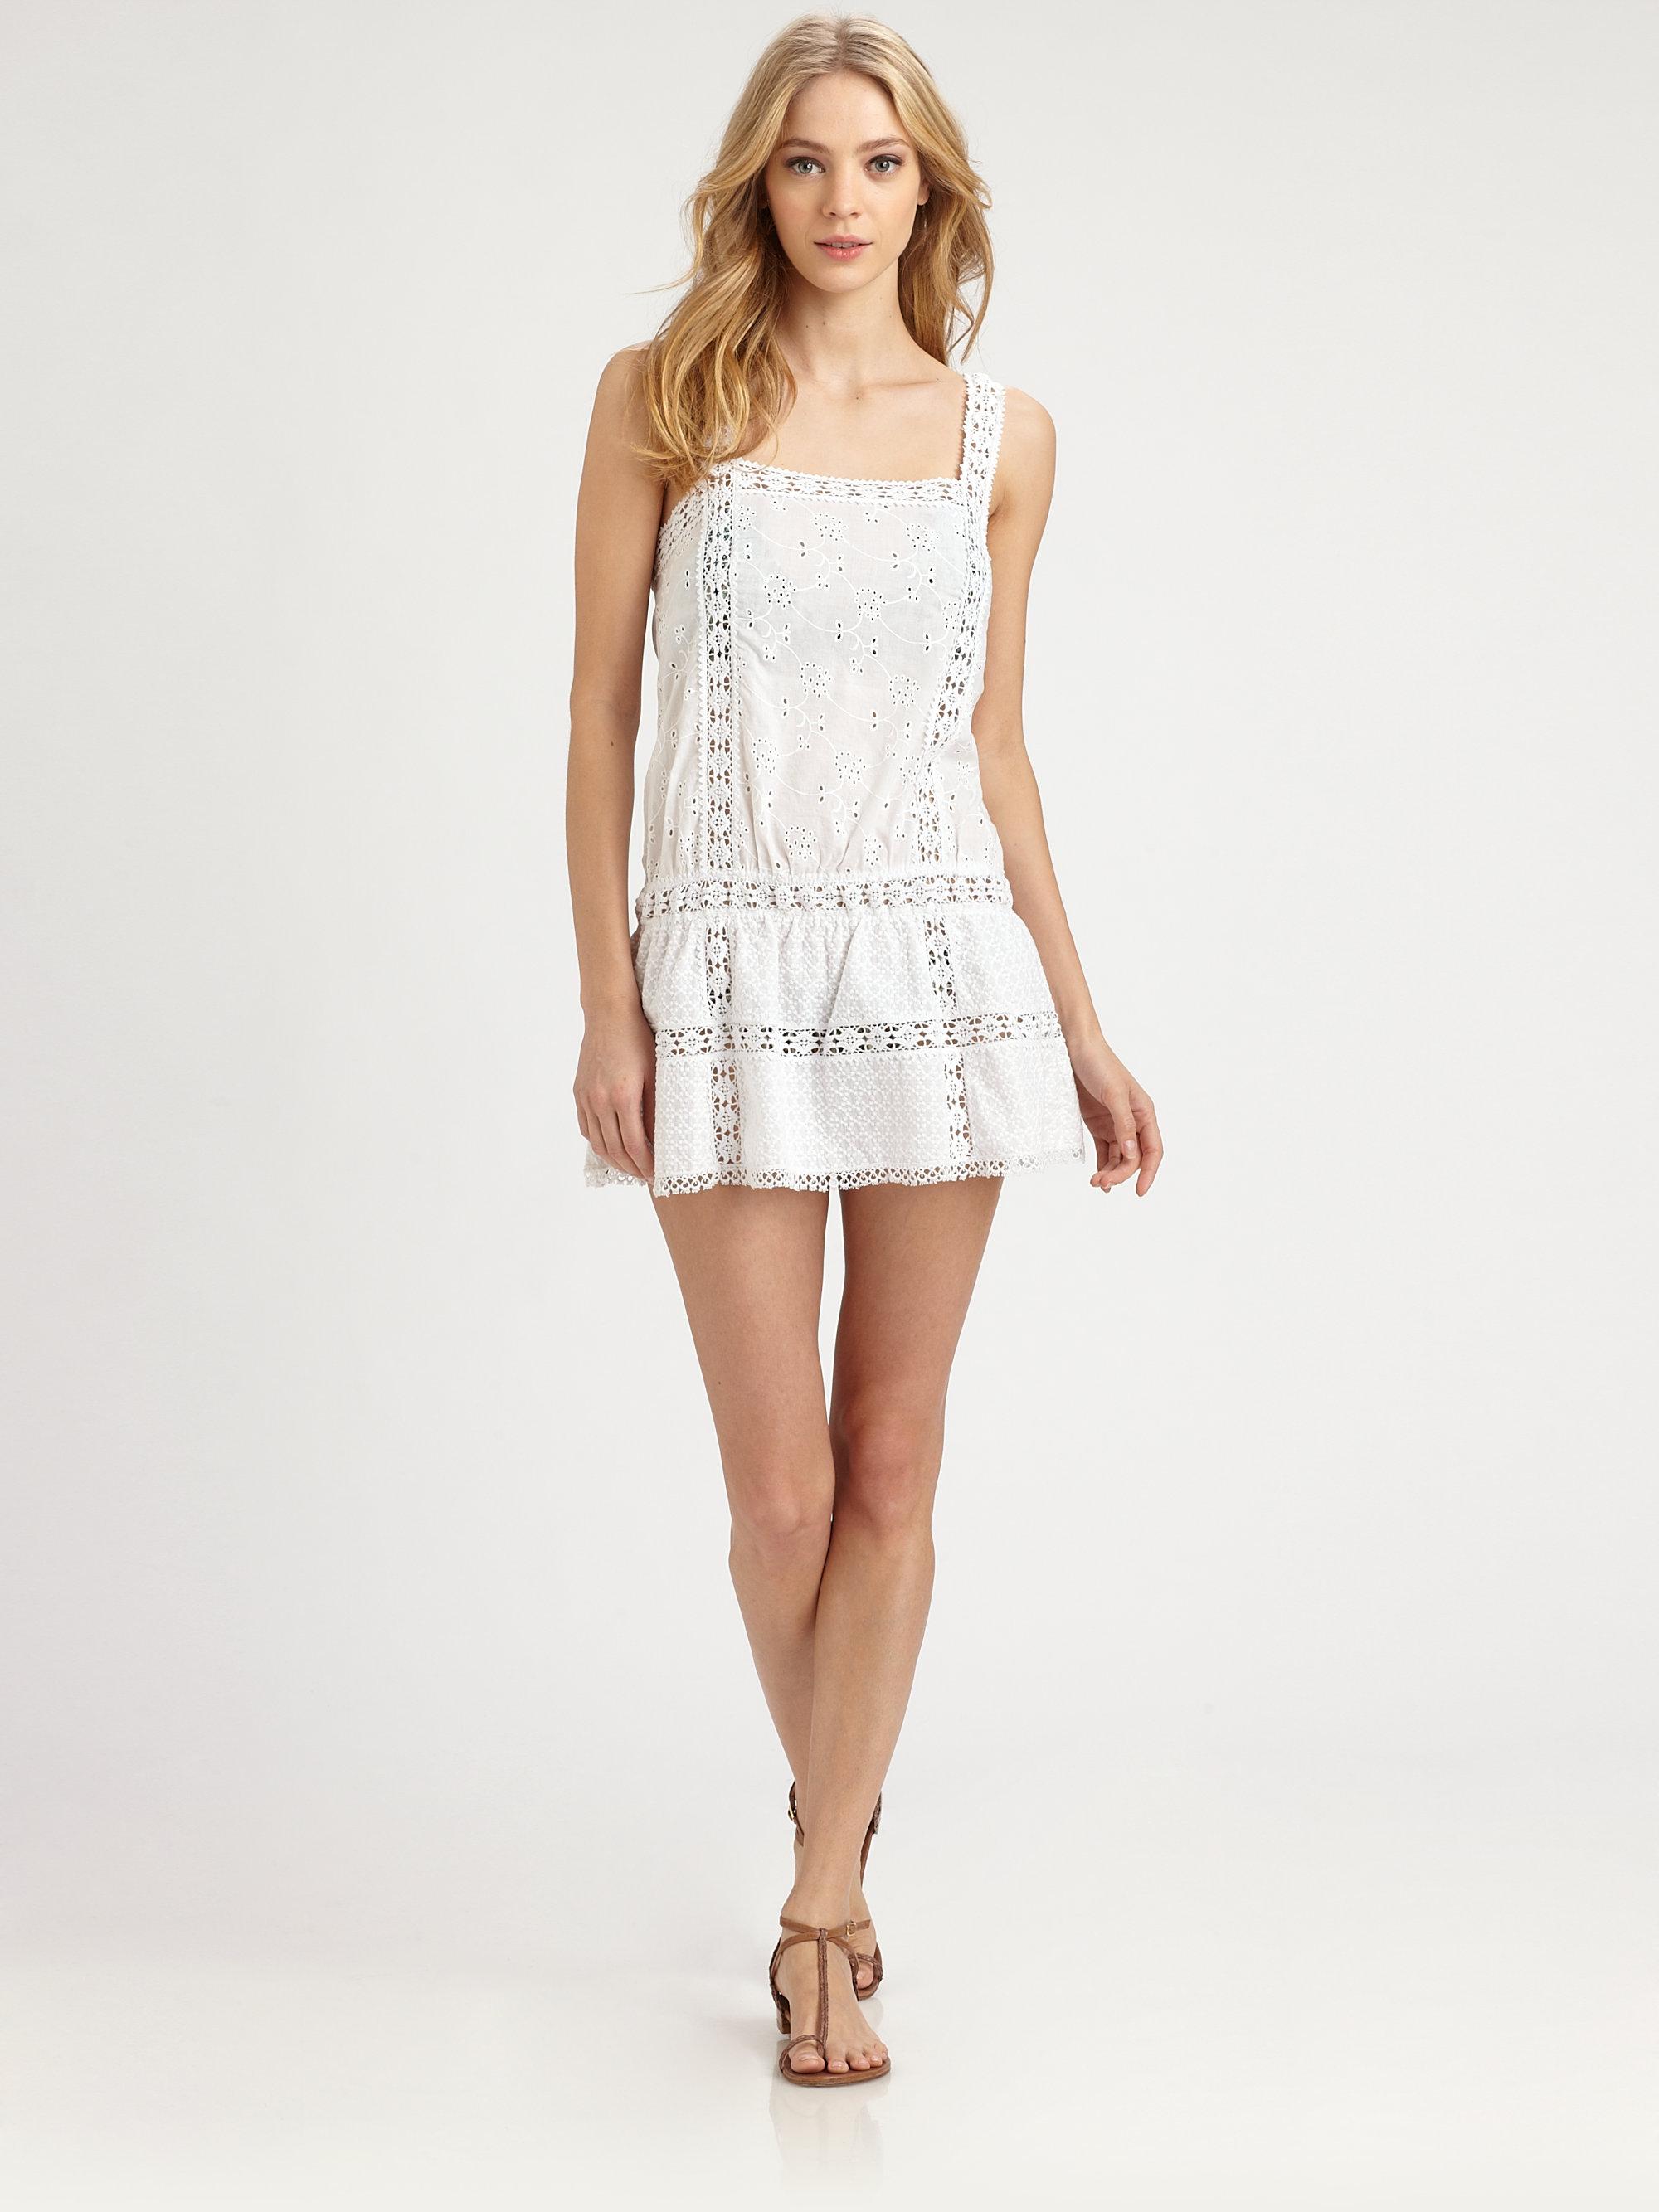 Ondademar Cotton Eyelet Dress in White  Lyst